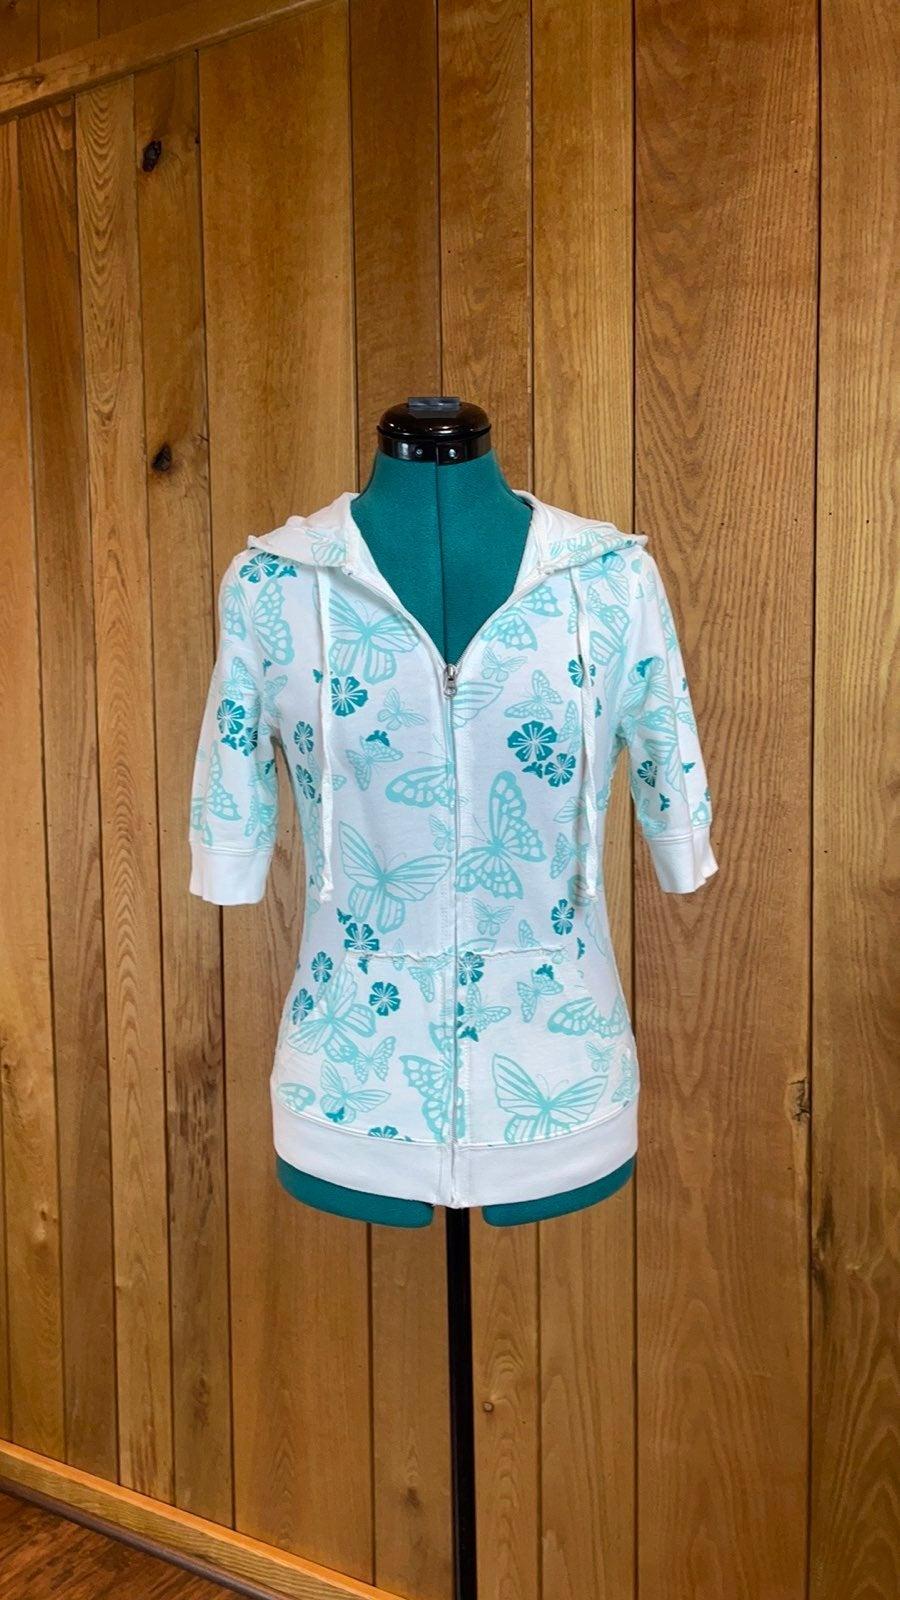 Turquoise Short Sleeve Zip Up Hoodie S